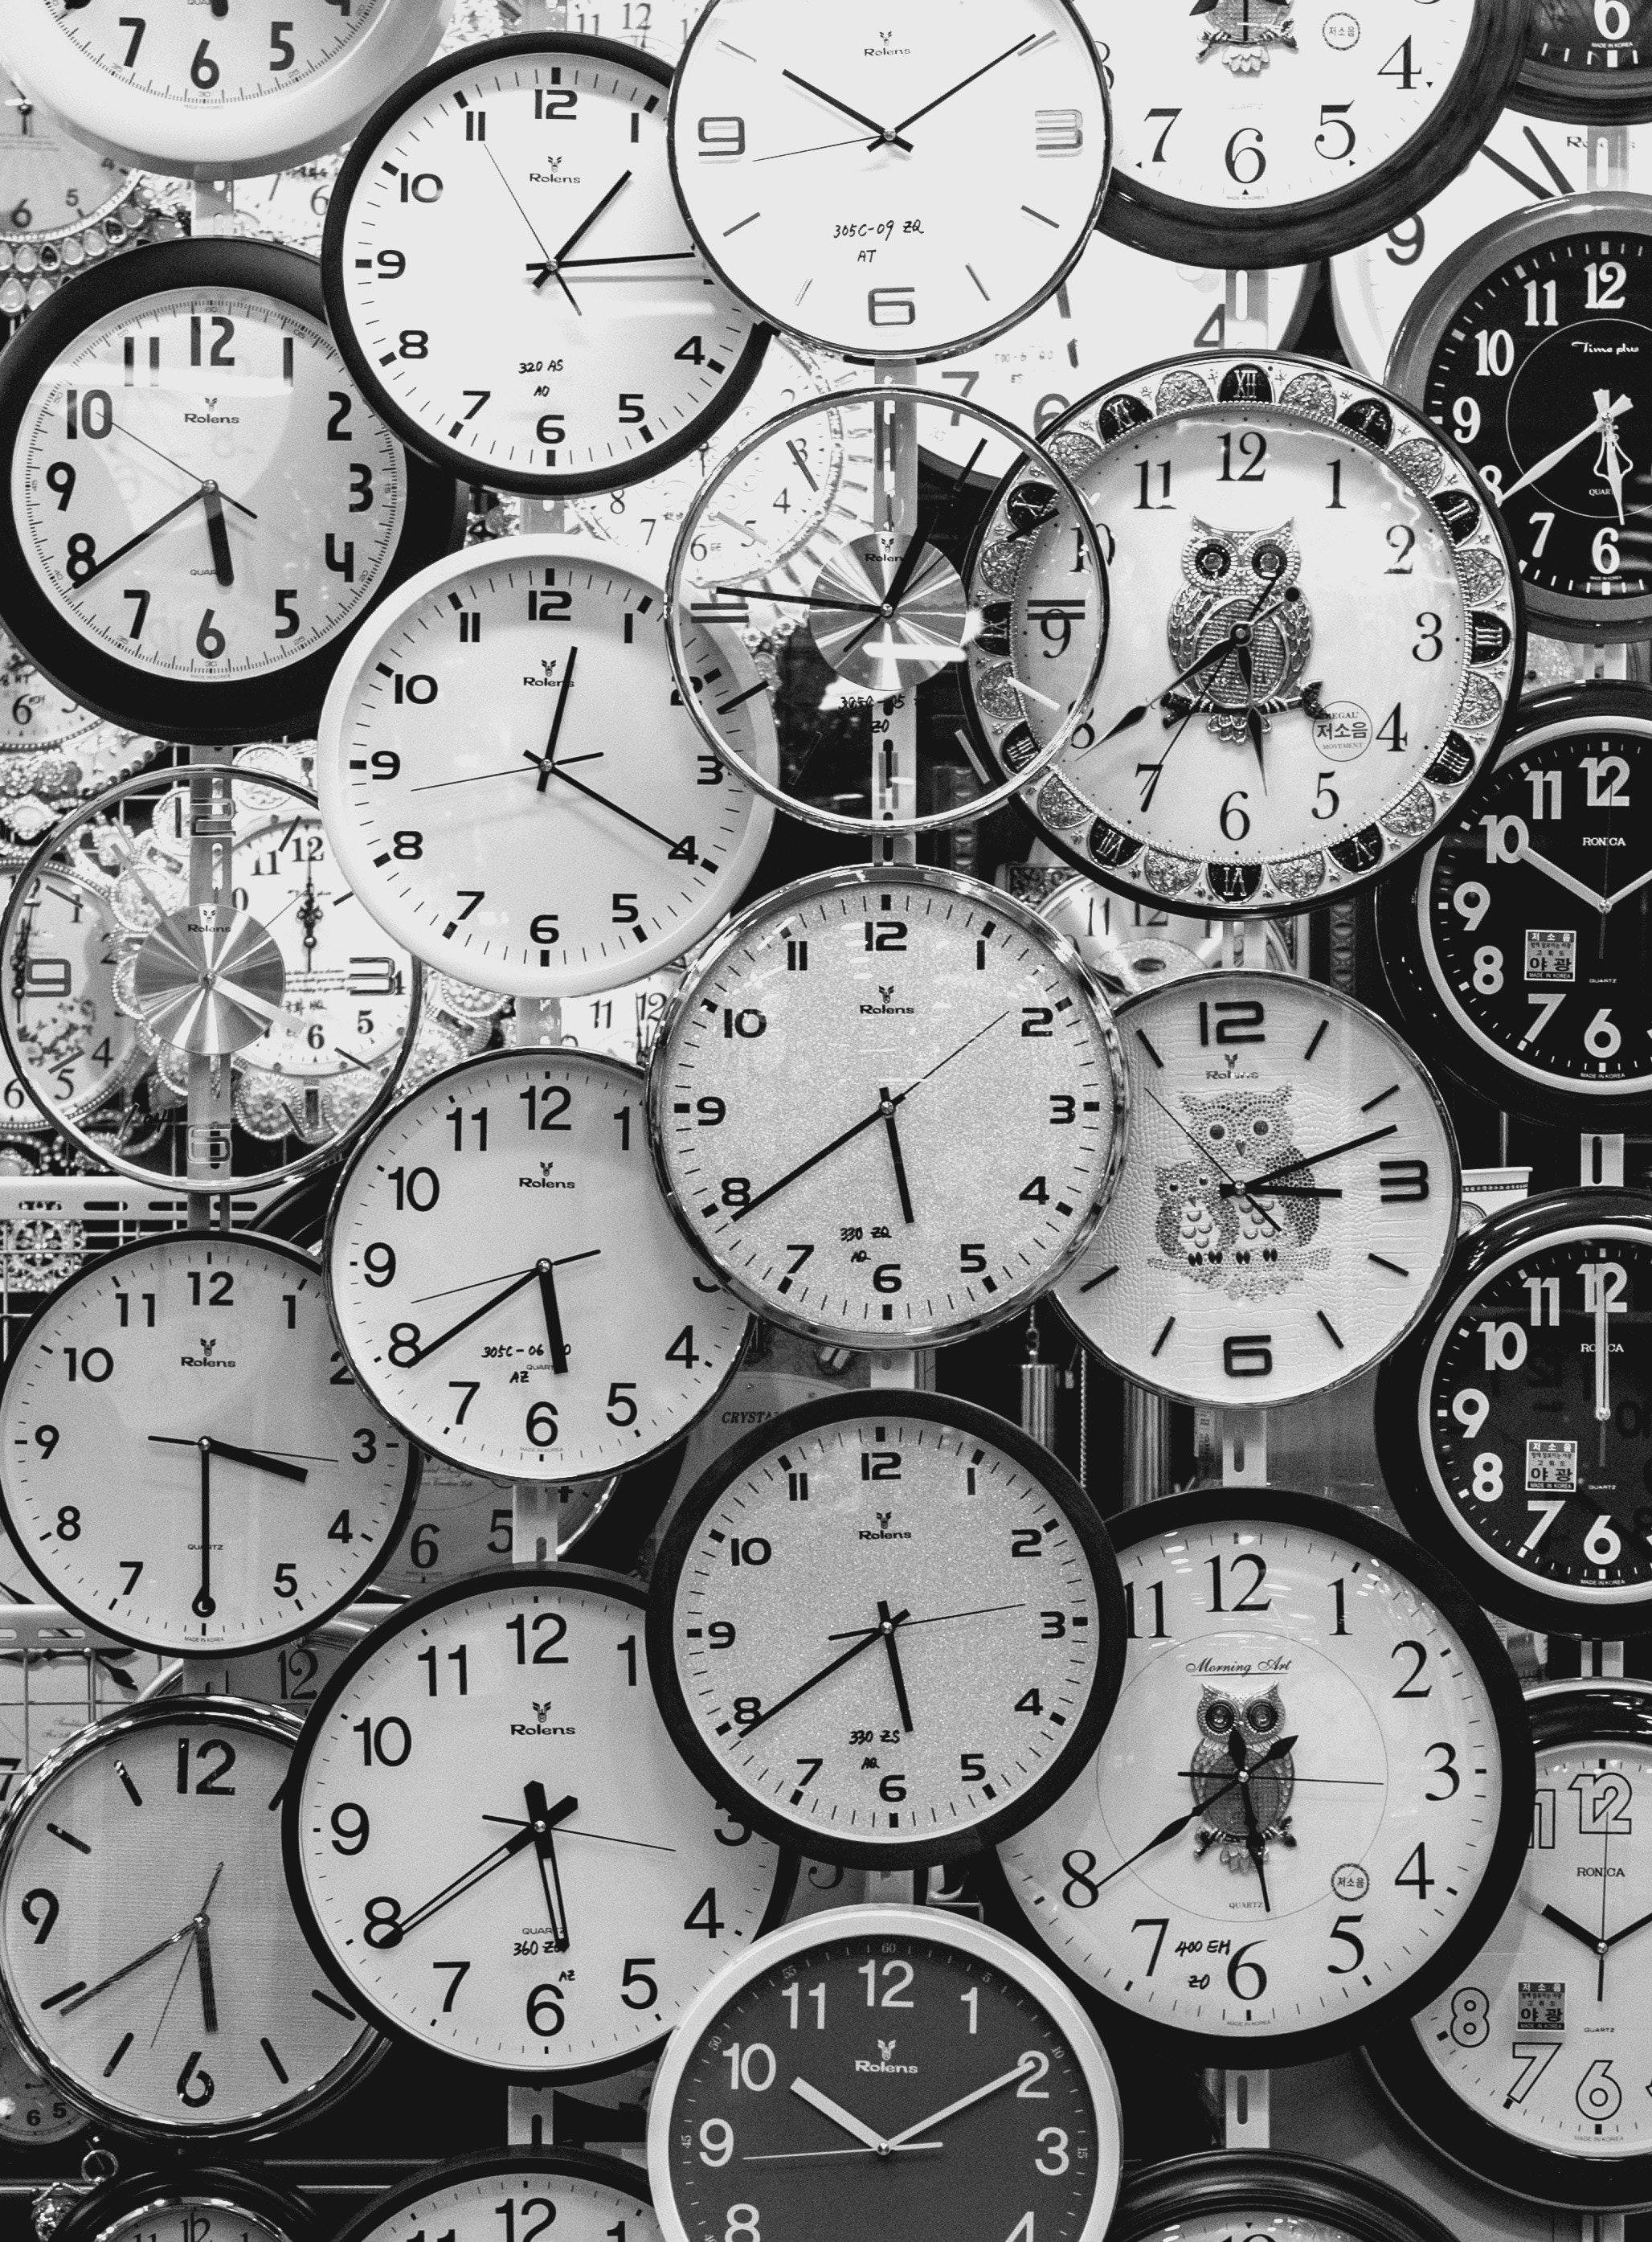 black-and-white-black-and-white-clocks-707676 (1)